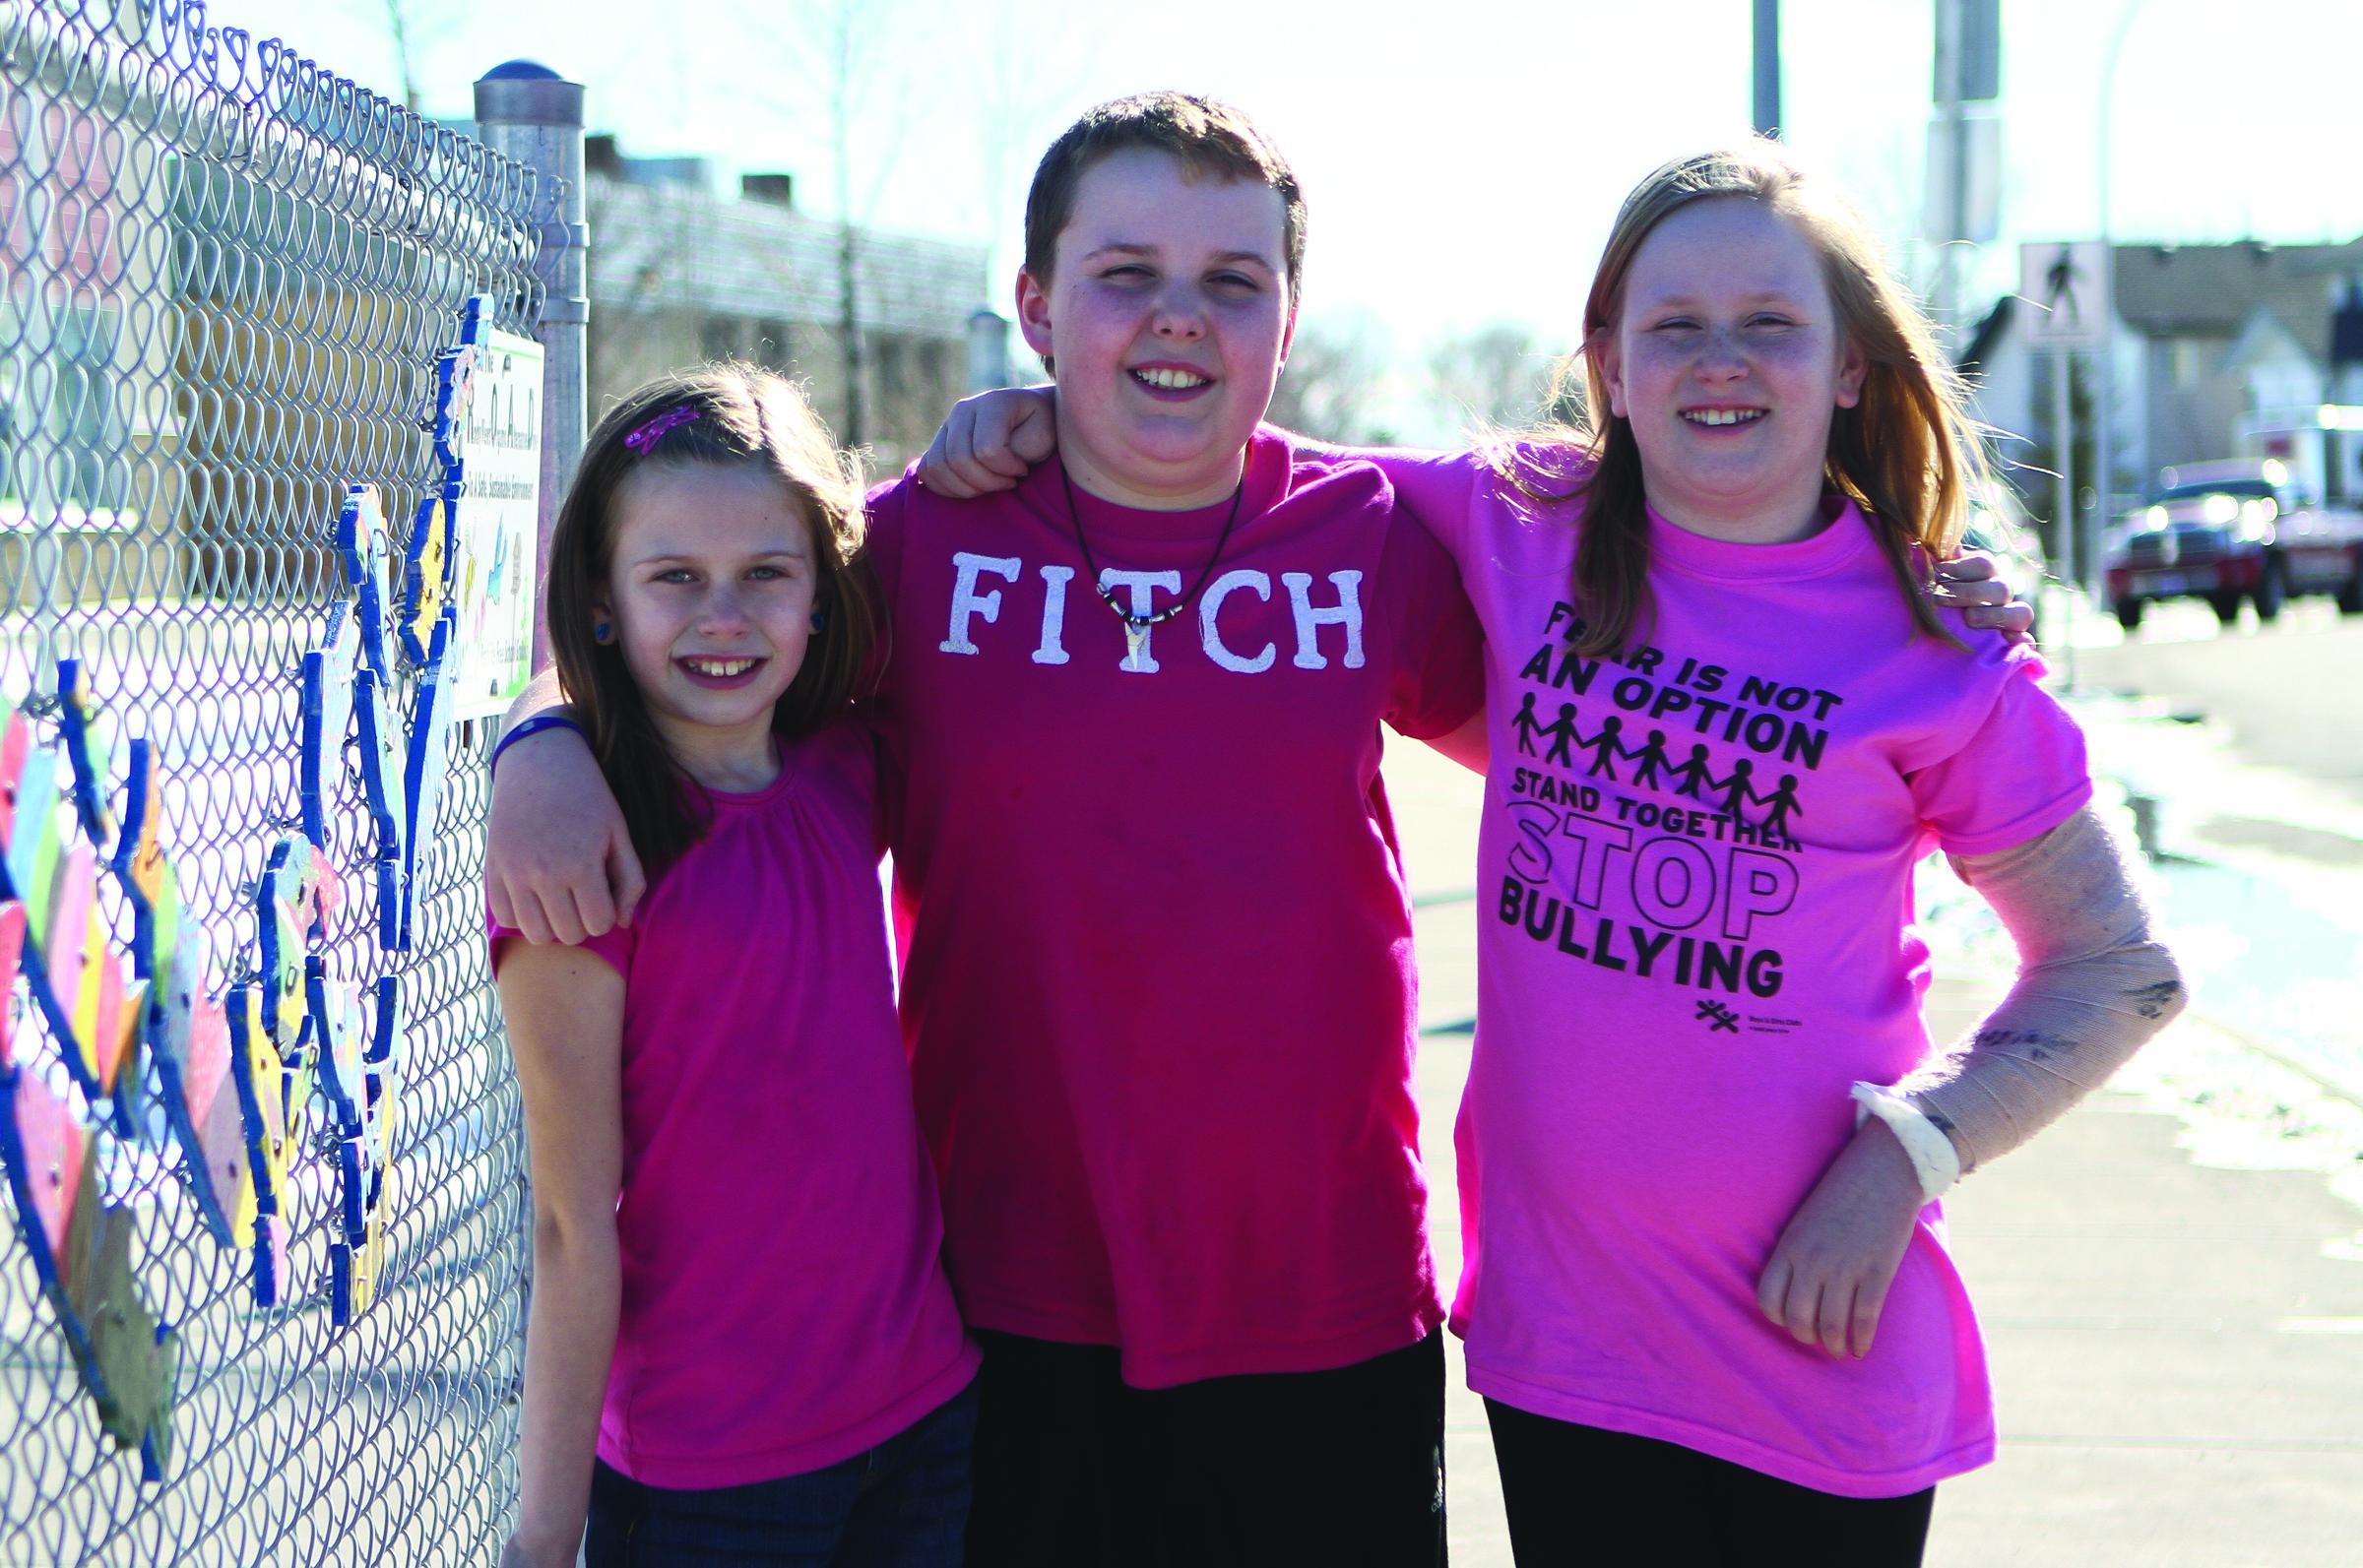 Stop Bullying Pink Shirt Day Anti-Bullying Women Long Sleeve T-Shirt Support